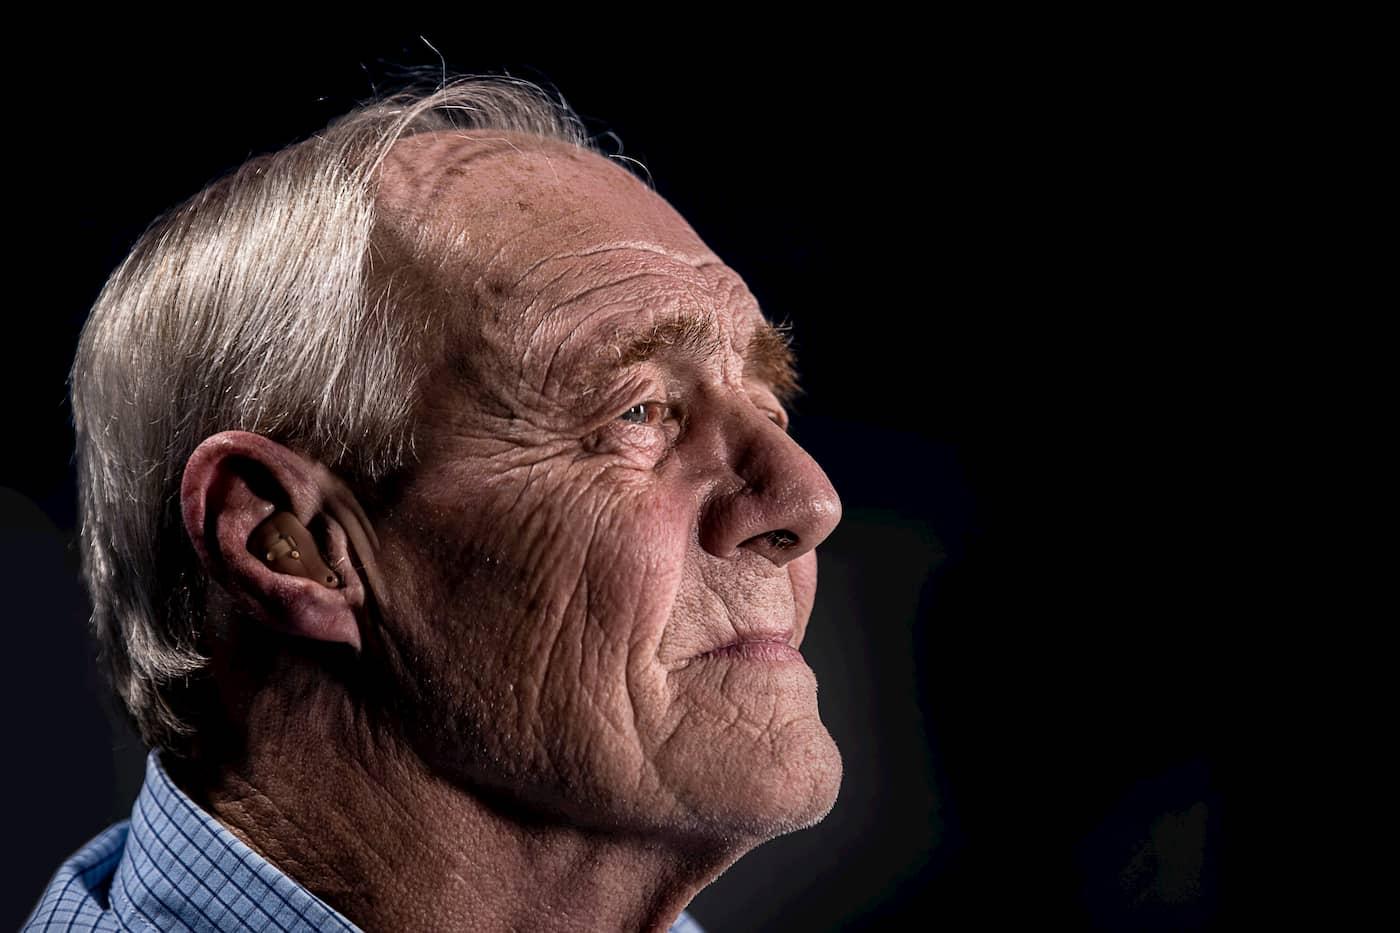 Older man who experienced trauma